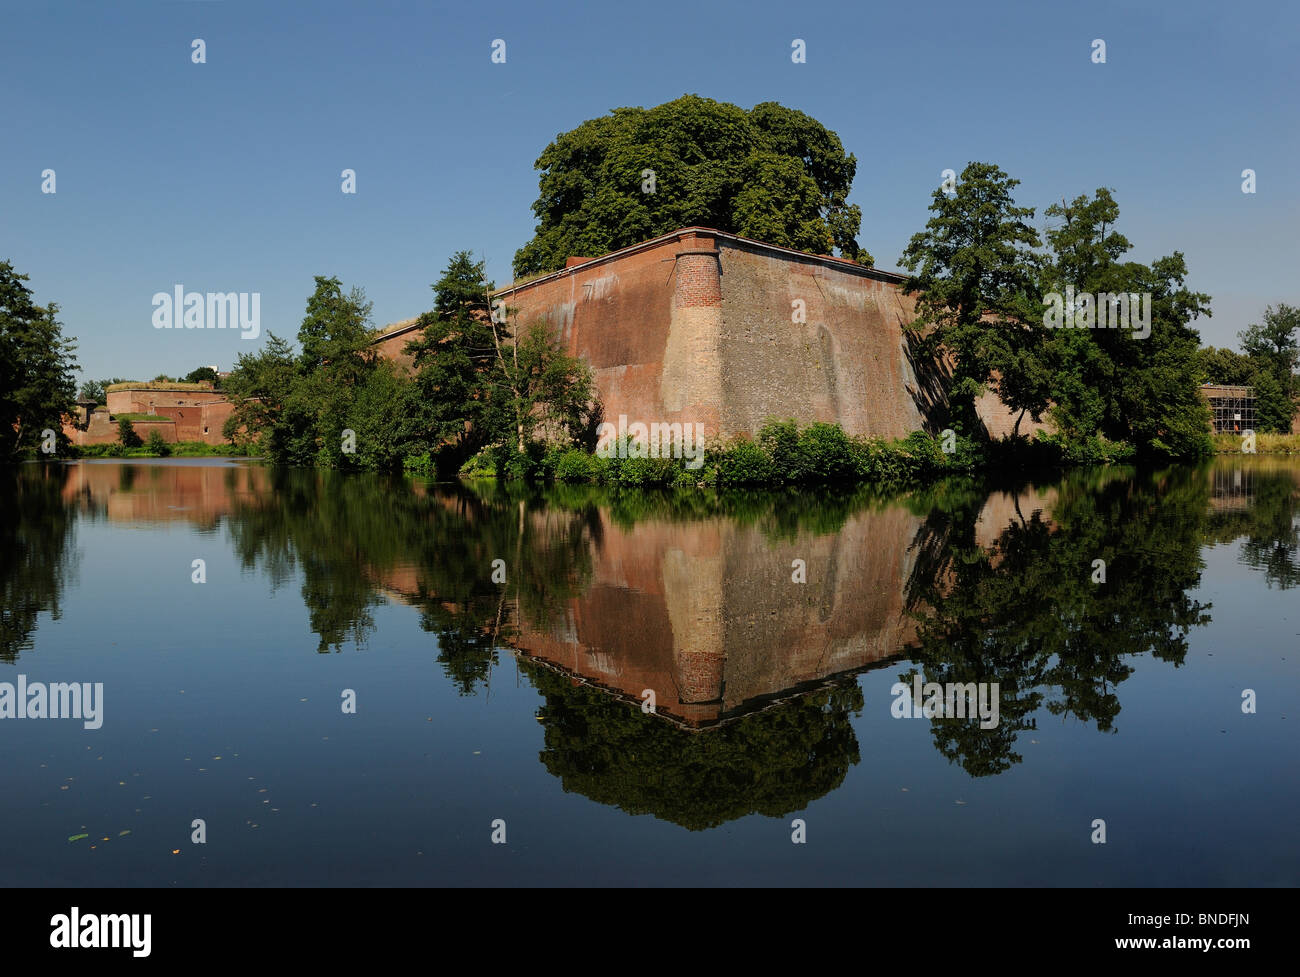 Spandau Citadel, Bastion Koenig and moat, Renaissance fortress, Spandau, Berlin, Germany, Europe Stock Photo